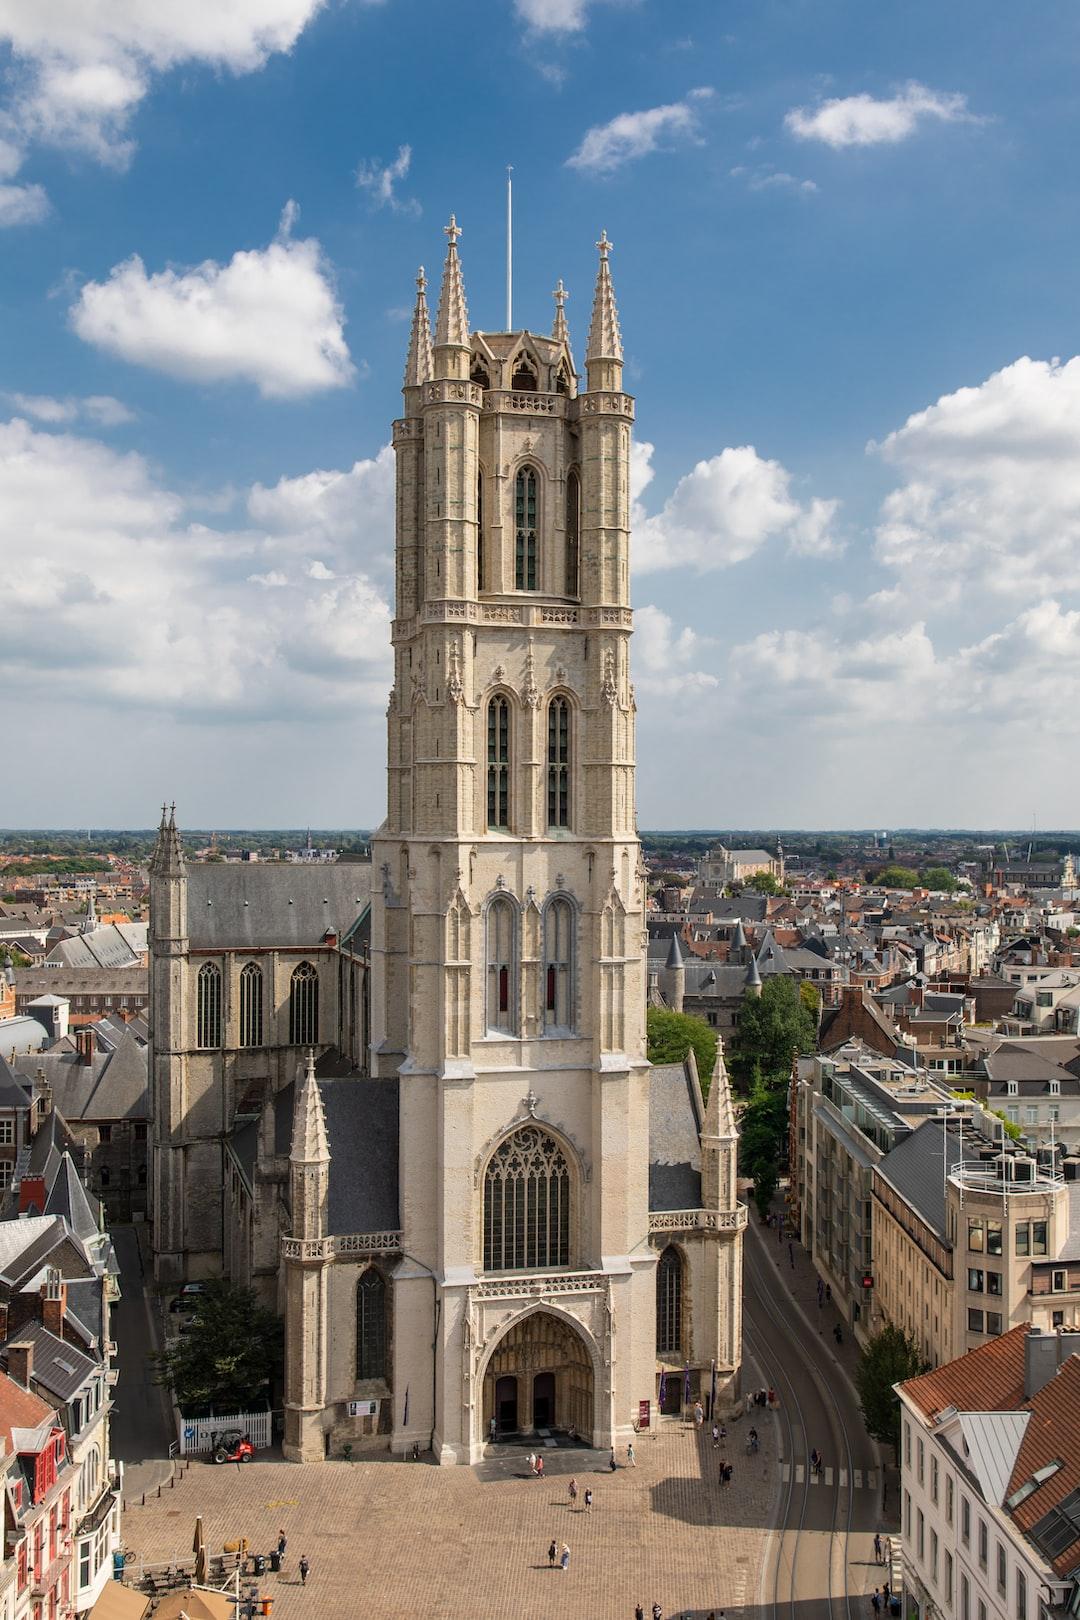 Saint Bavo's Cathedral.